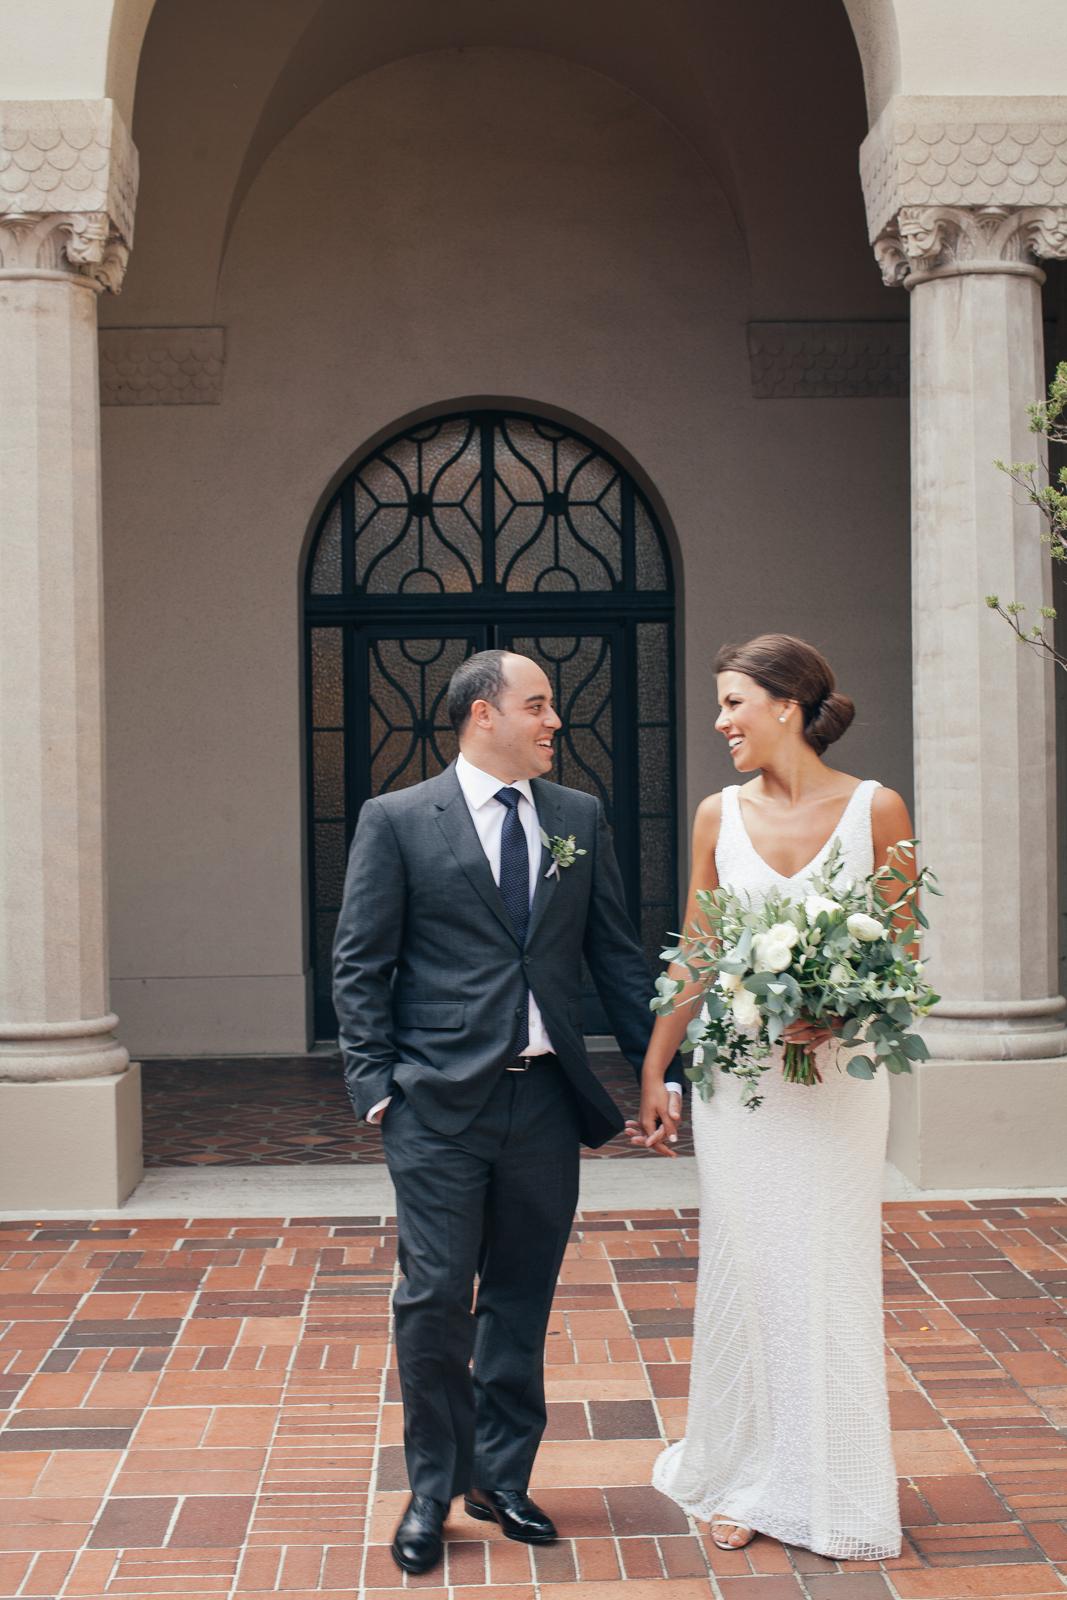 temple_emmanuel_jewish_wedding_san_francisco_ca_sarah_andrew_ebony_siovhan_bokeh_photography_23.jpg